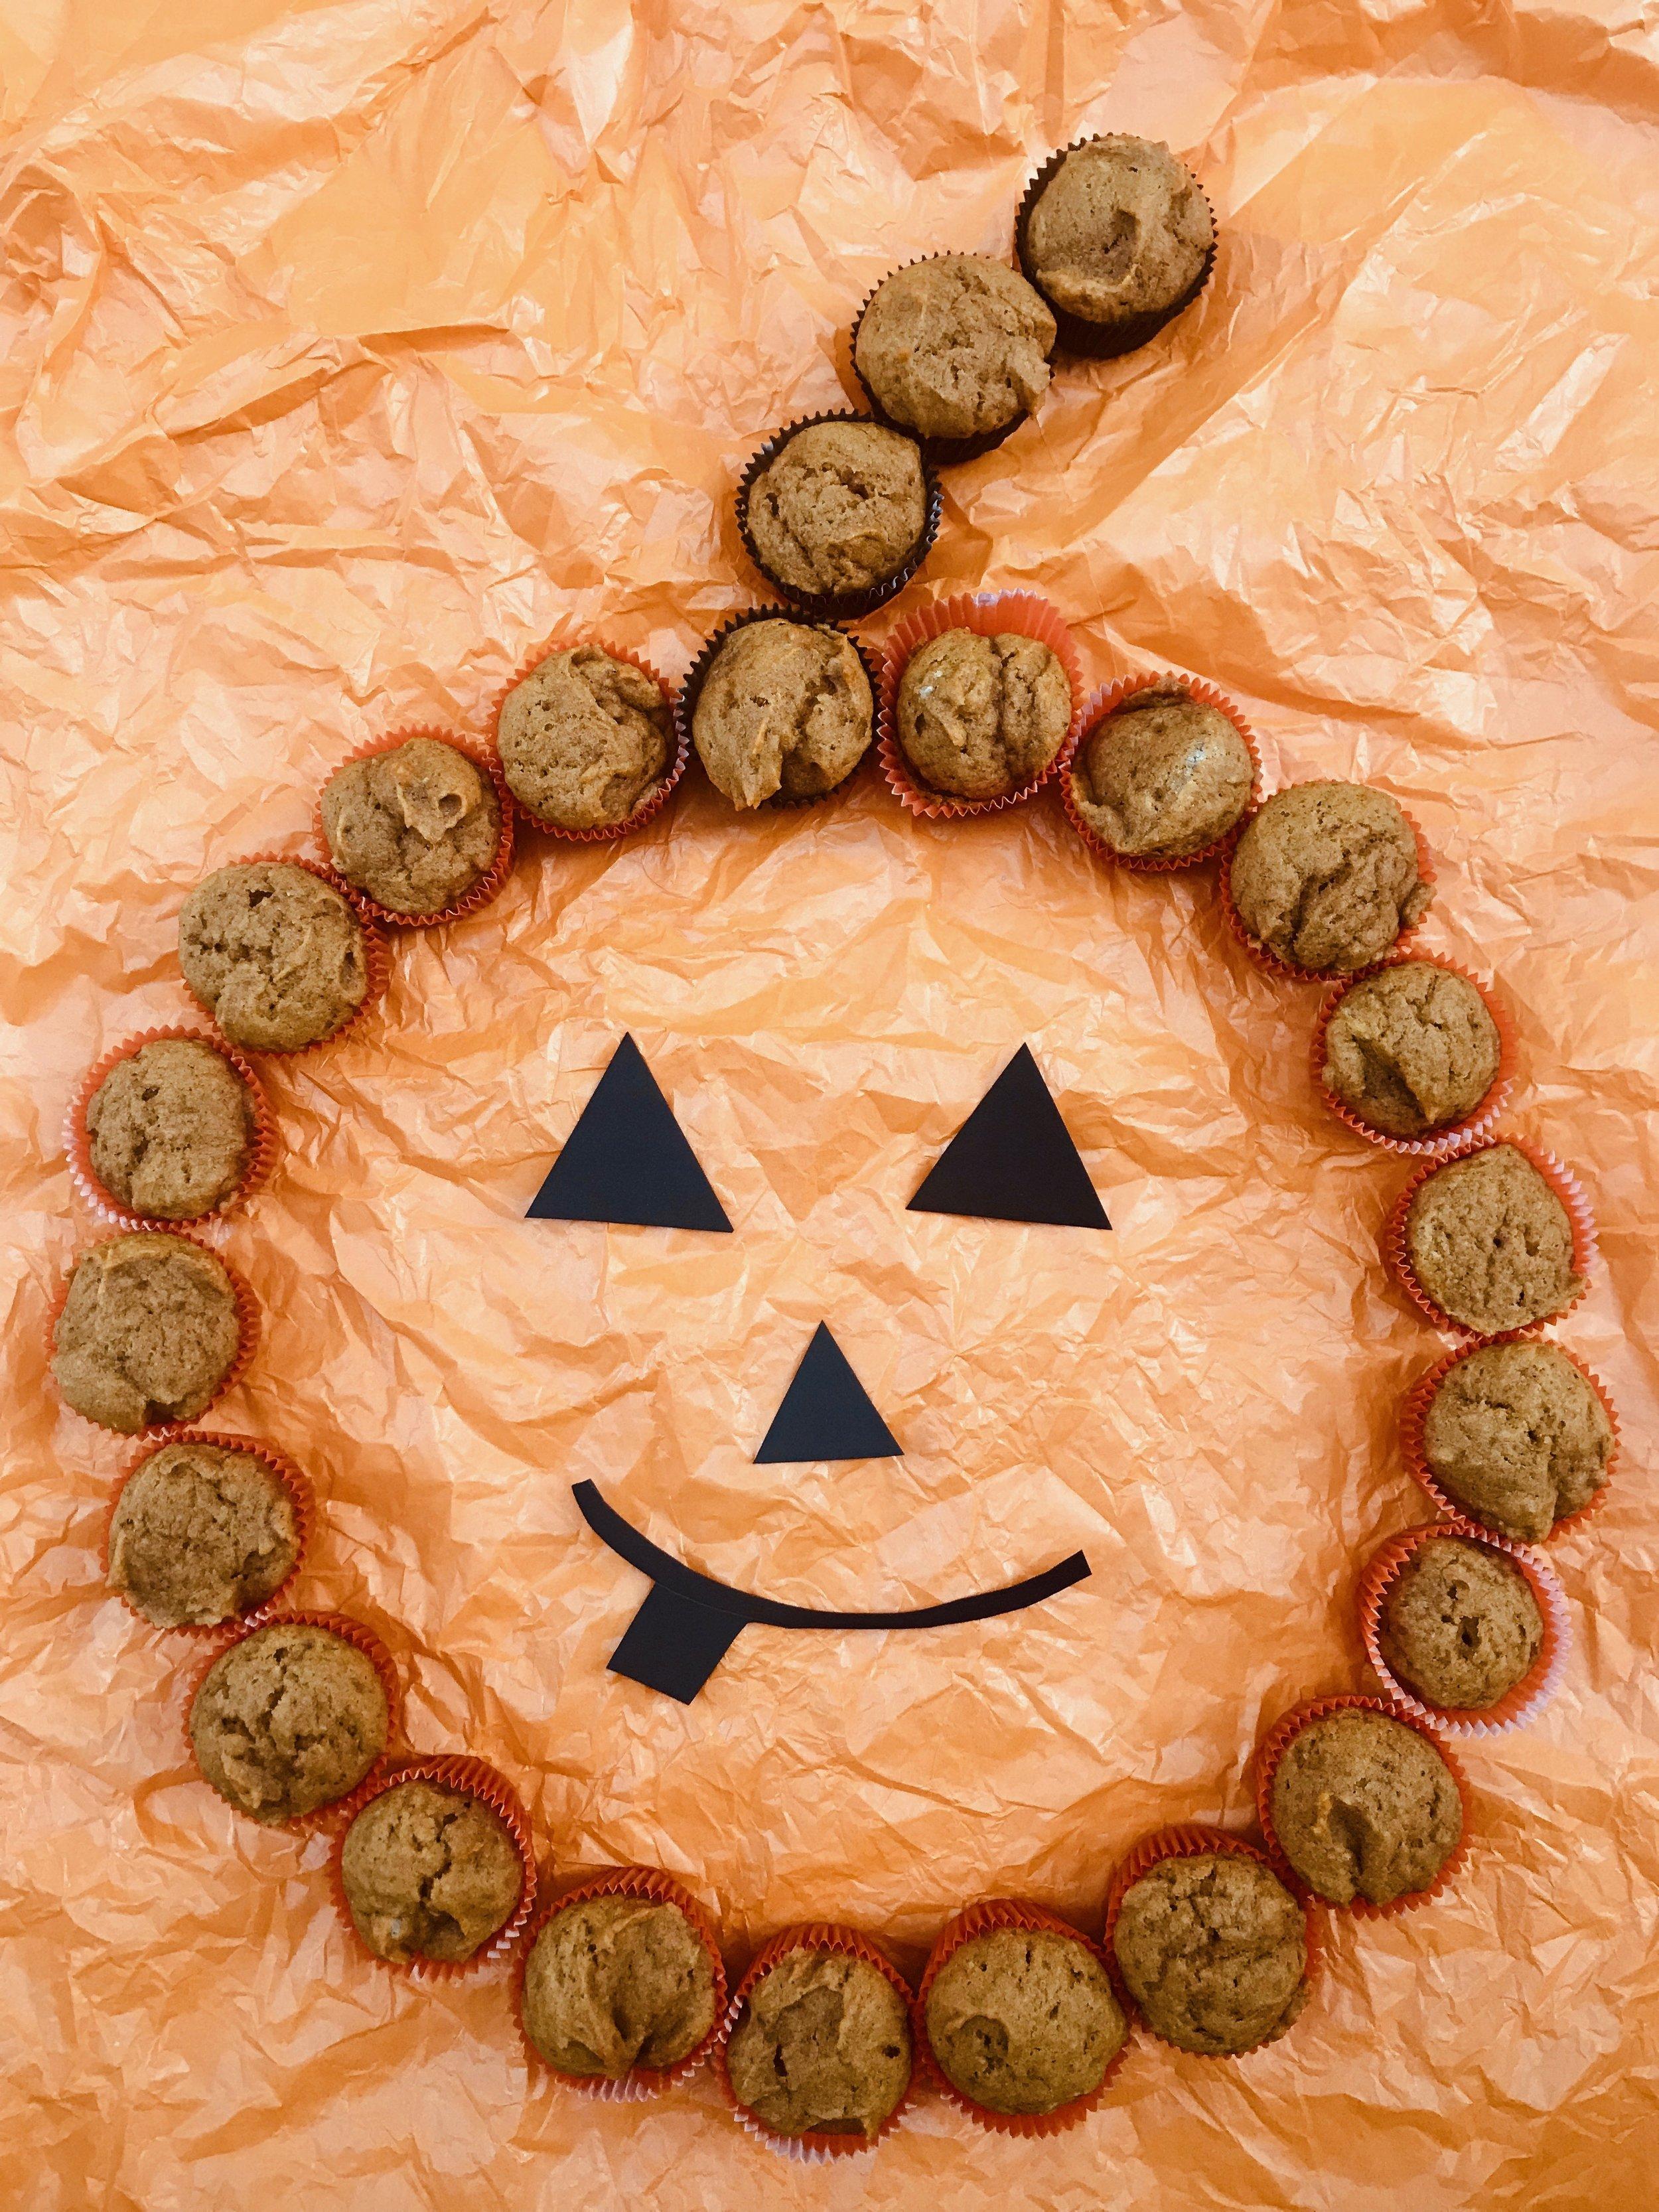 Day 293. I made Pumpkin Muffins